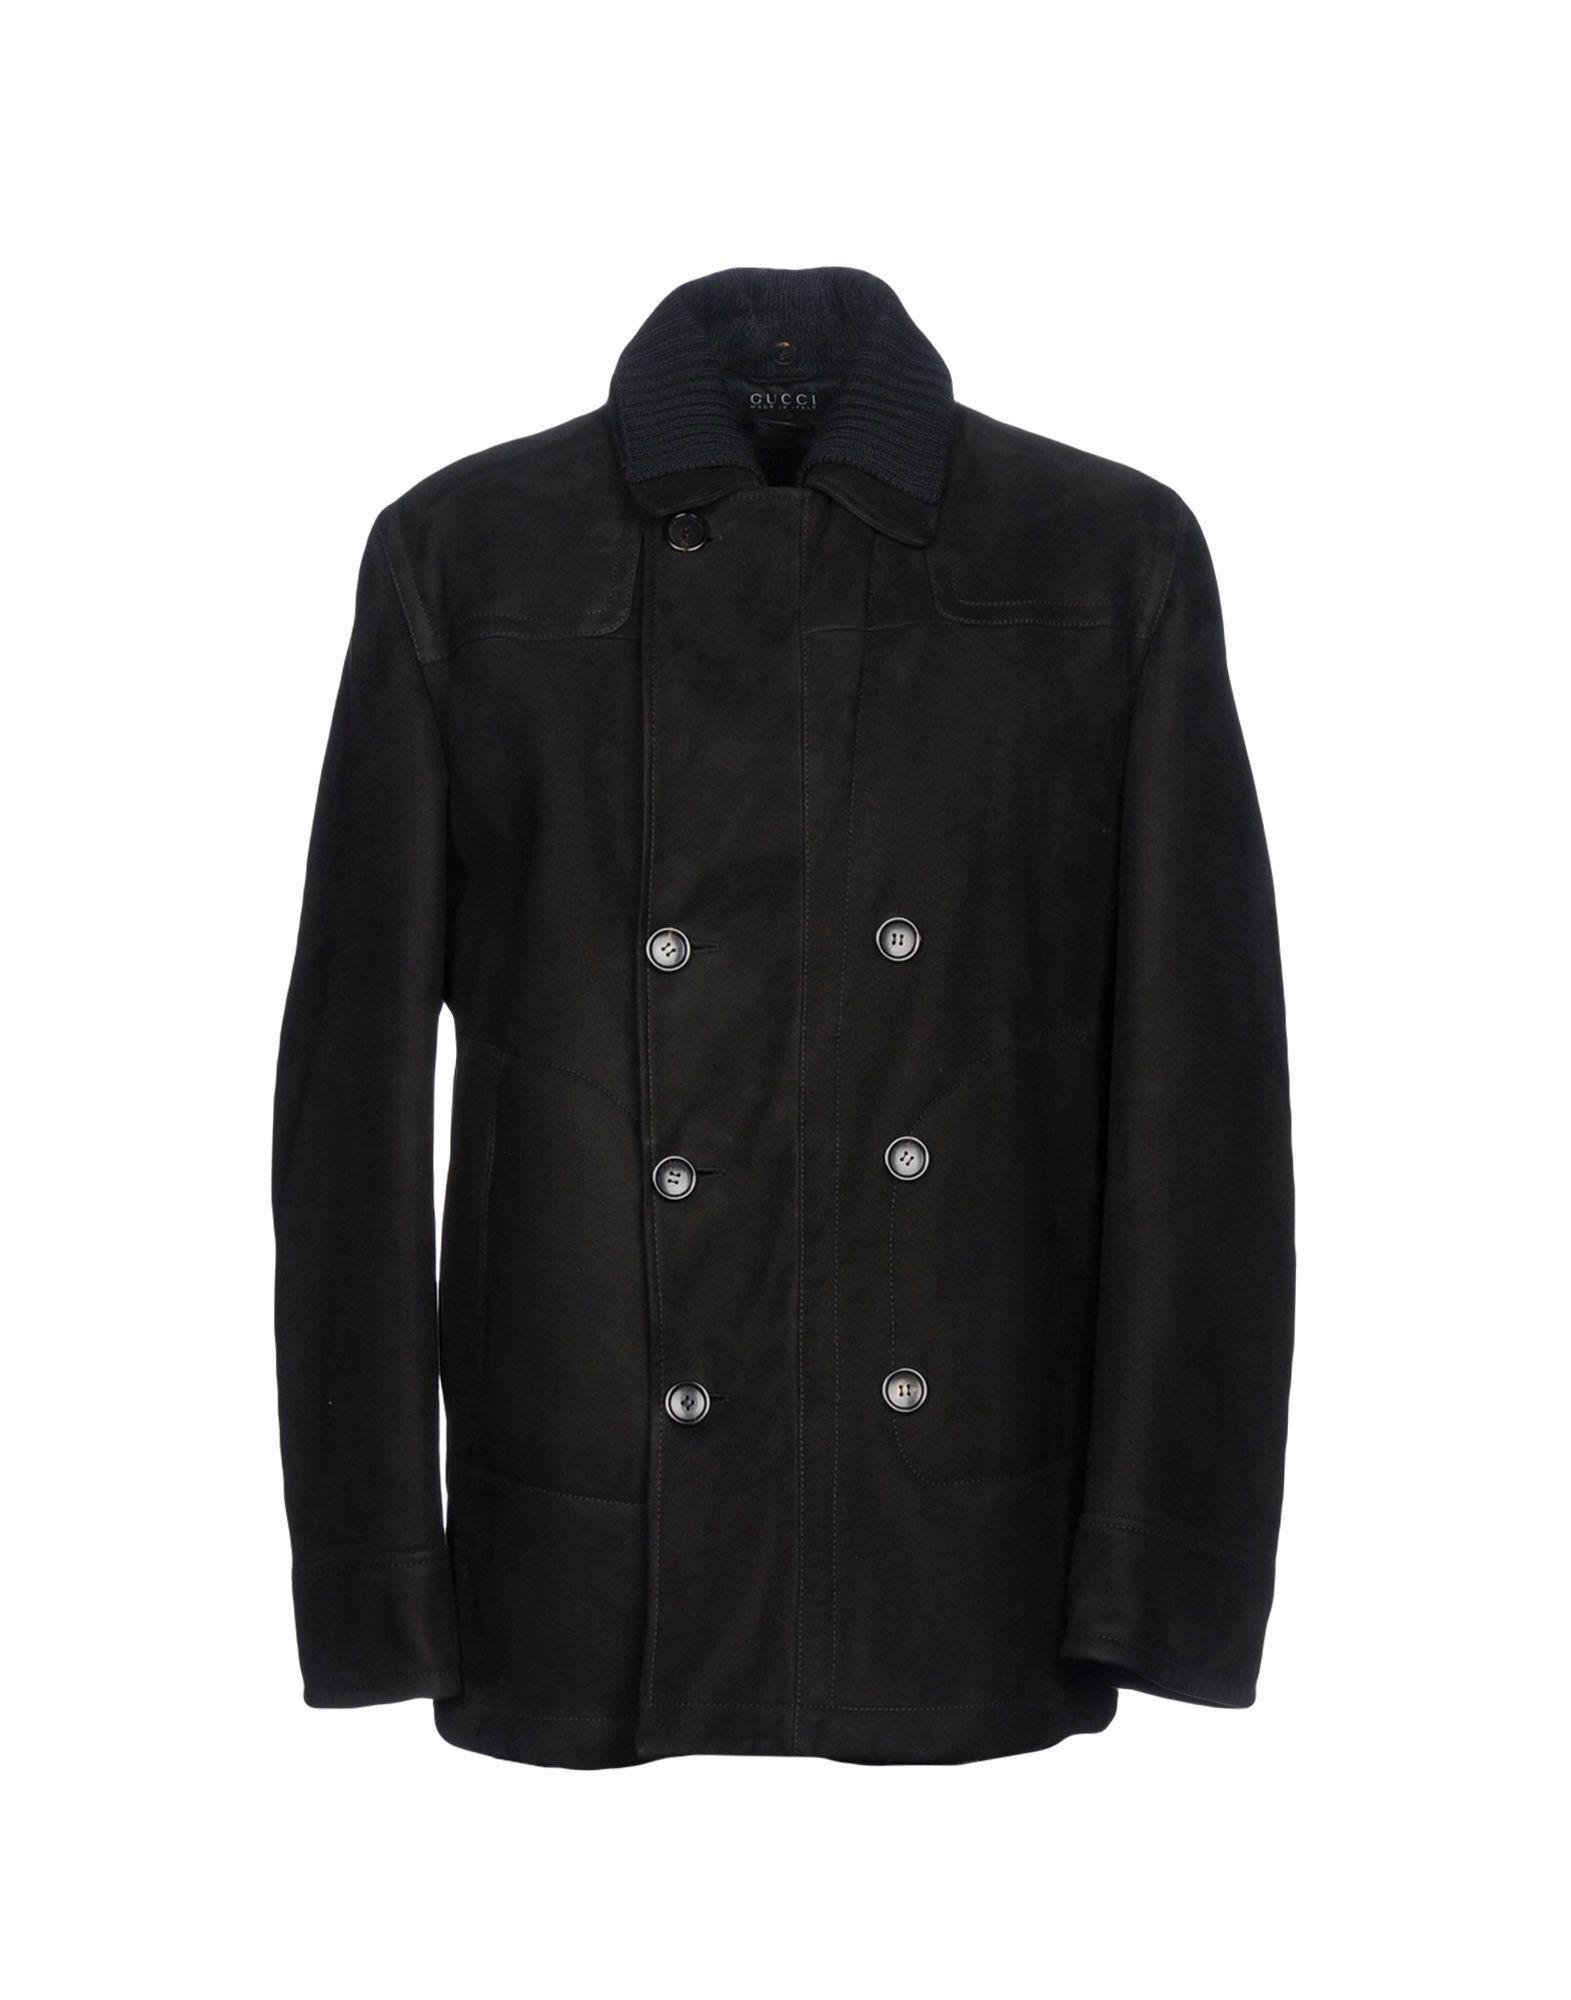 Gucci Shearling In Black